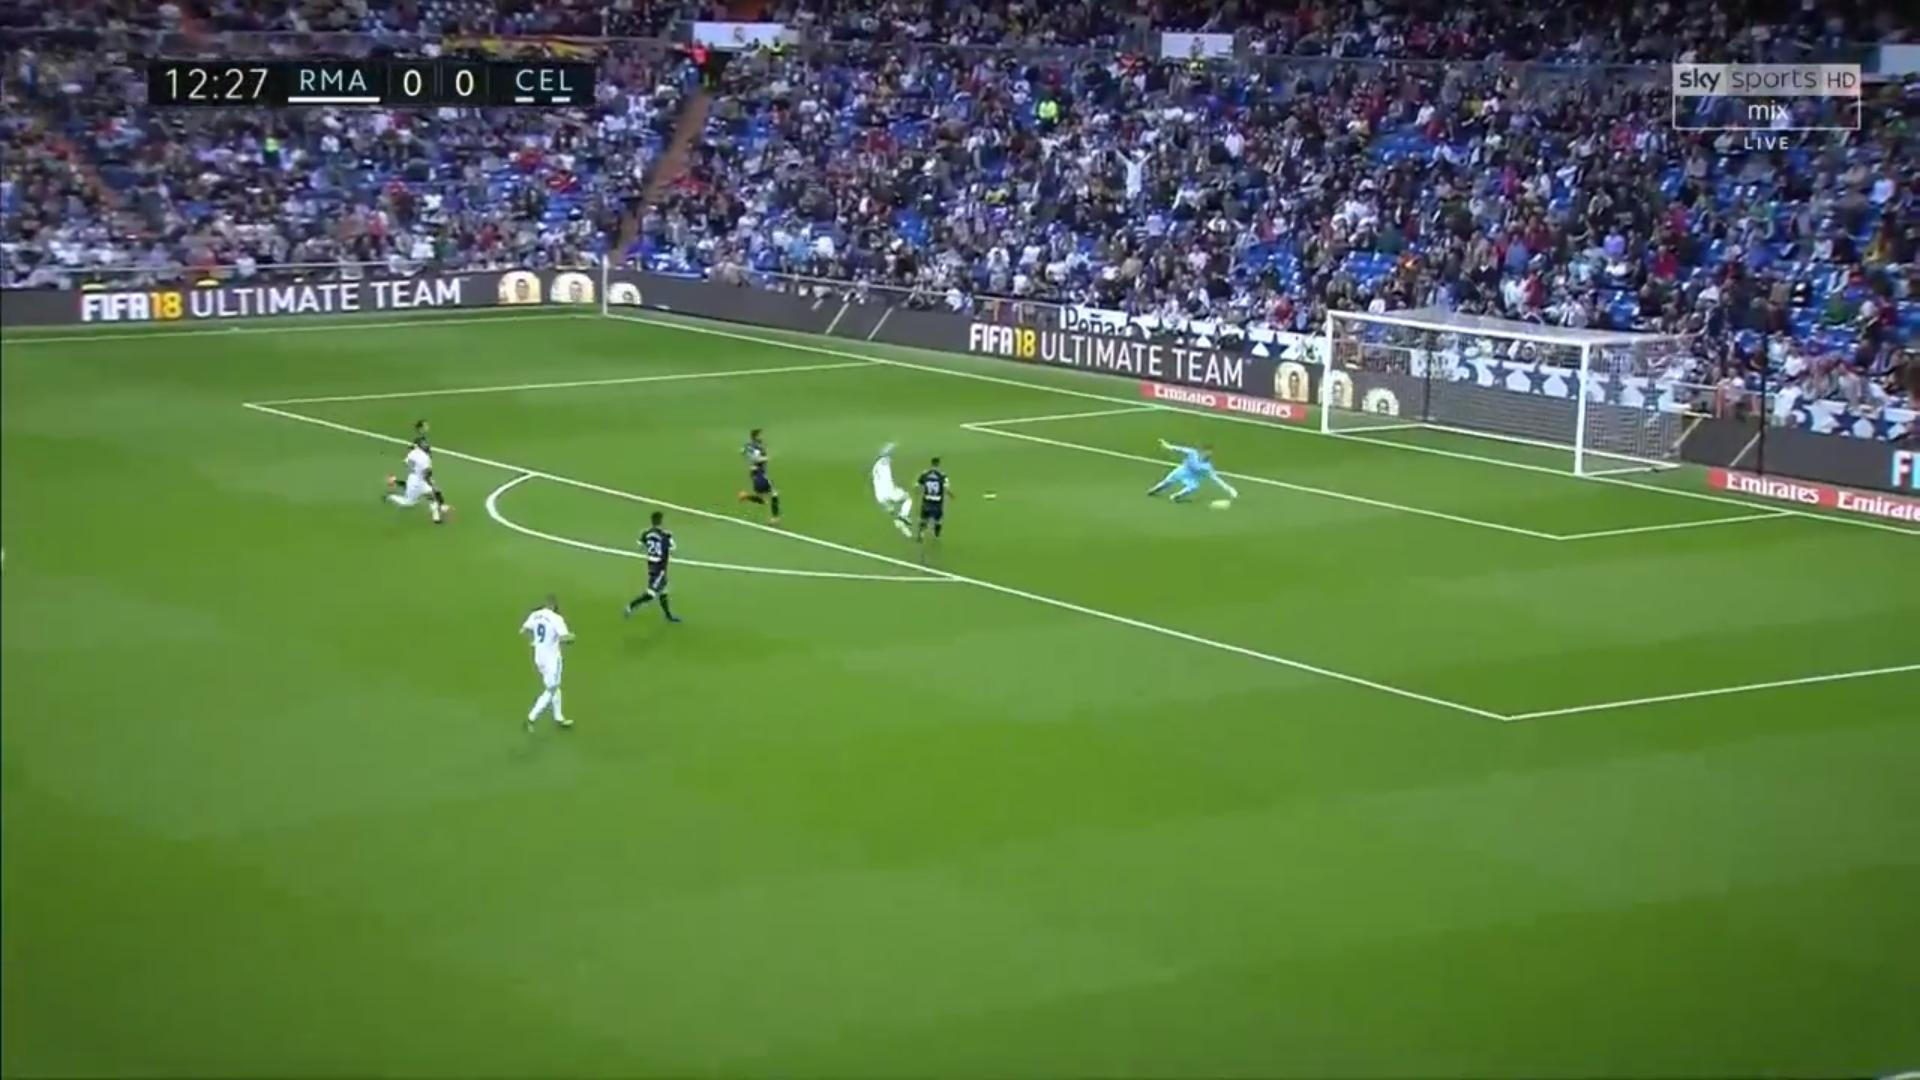 12-05-2018 - Real Madrid 6-0 Celta Vigo